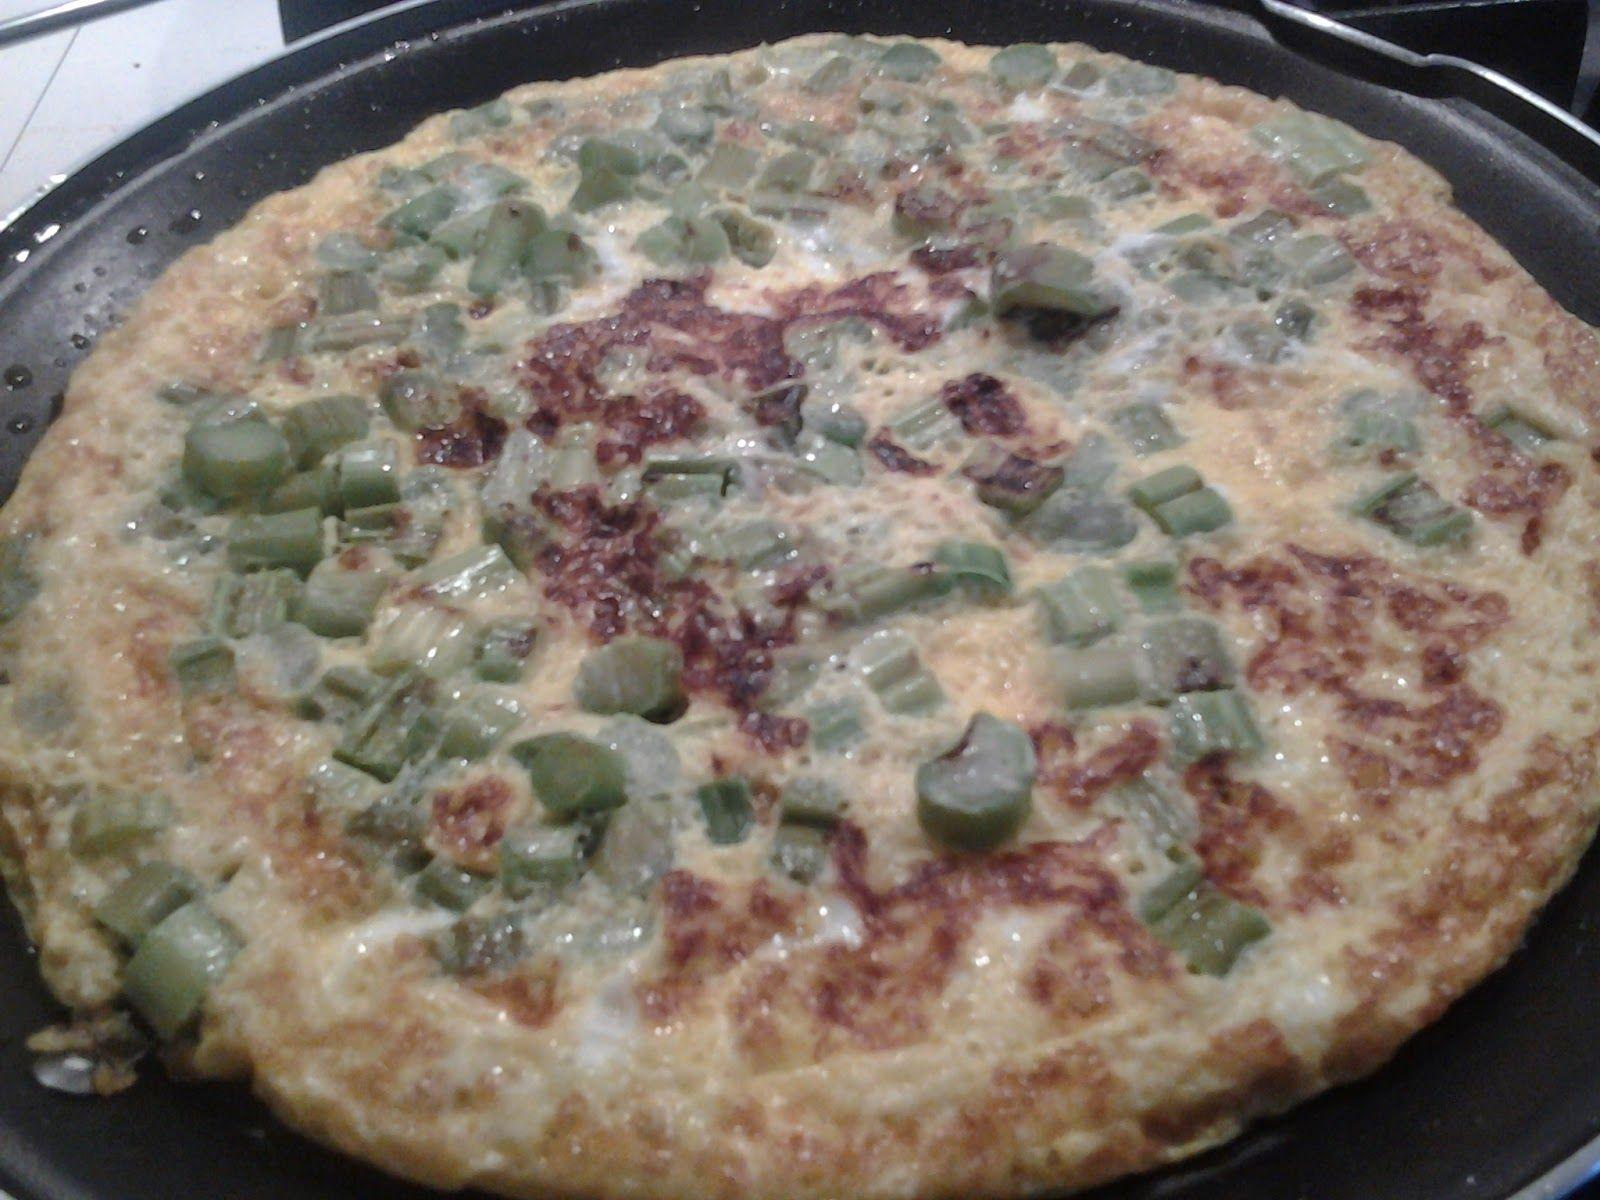 La mia cucina facile: Frittata agli asparagi